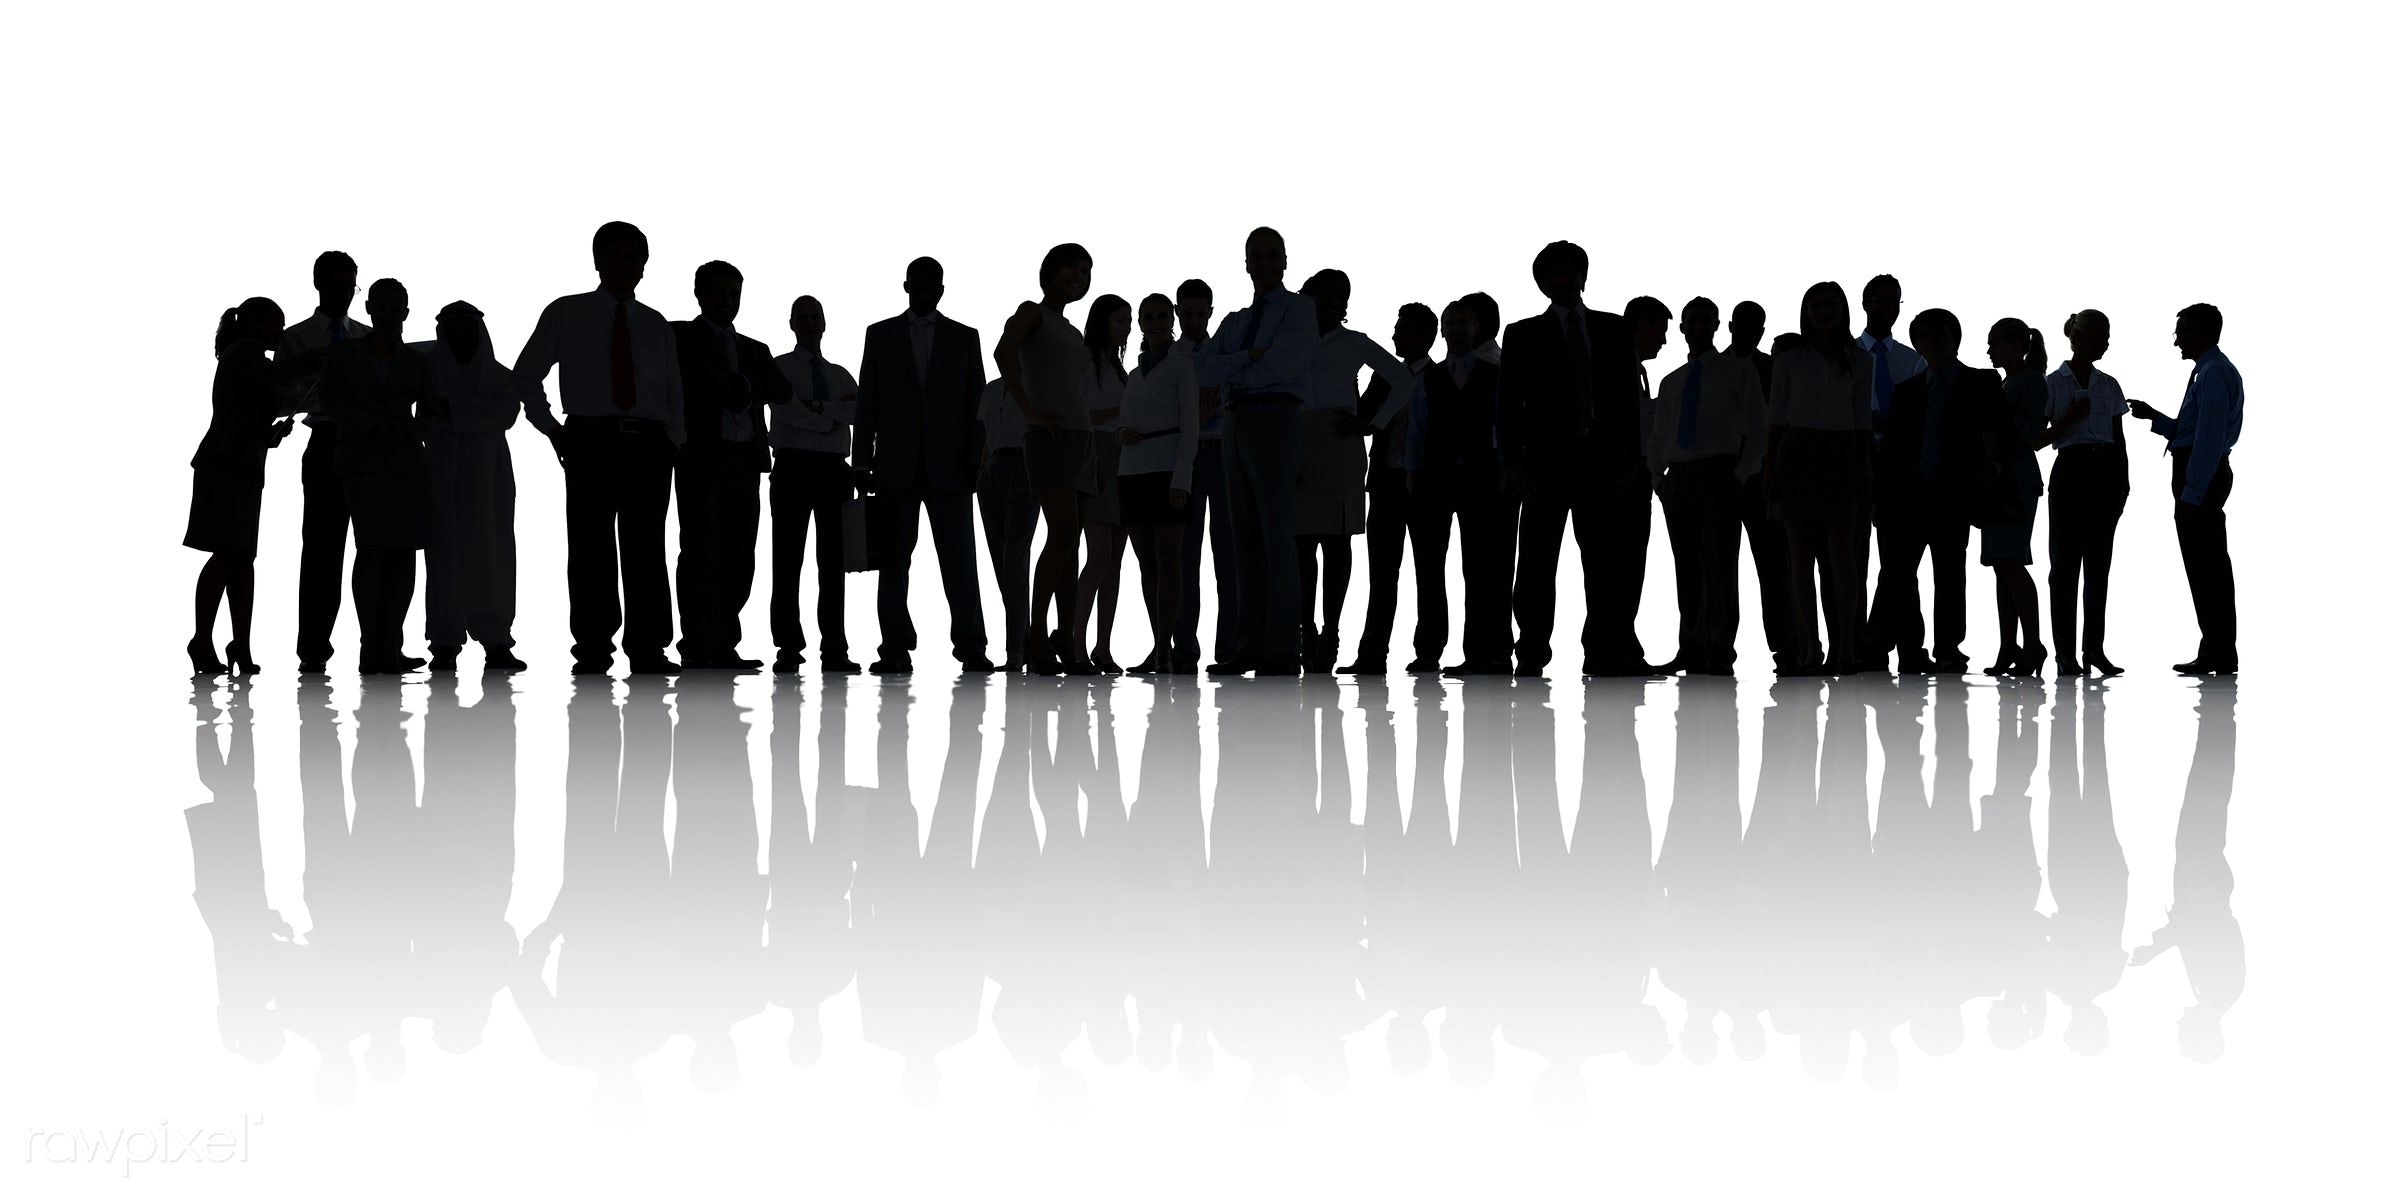 advice, agreement, black, brainstorming, business, business meeting, business people, business person, businessman,...